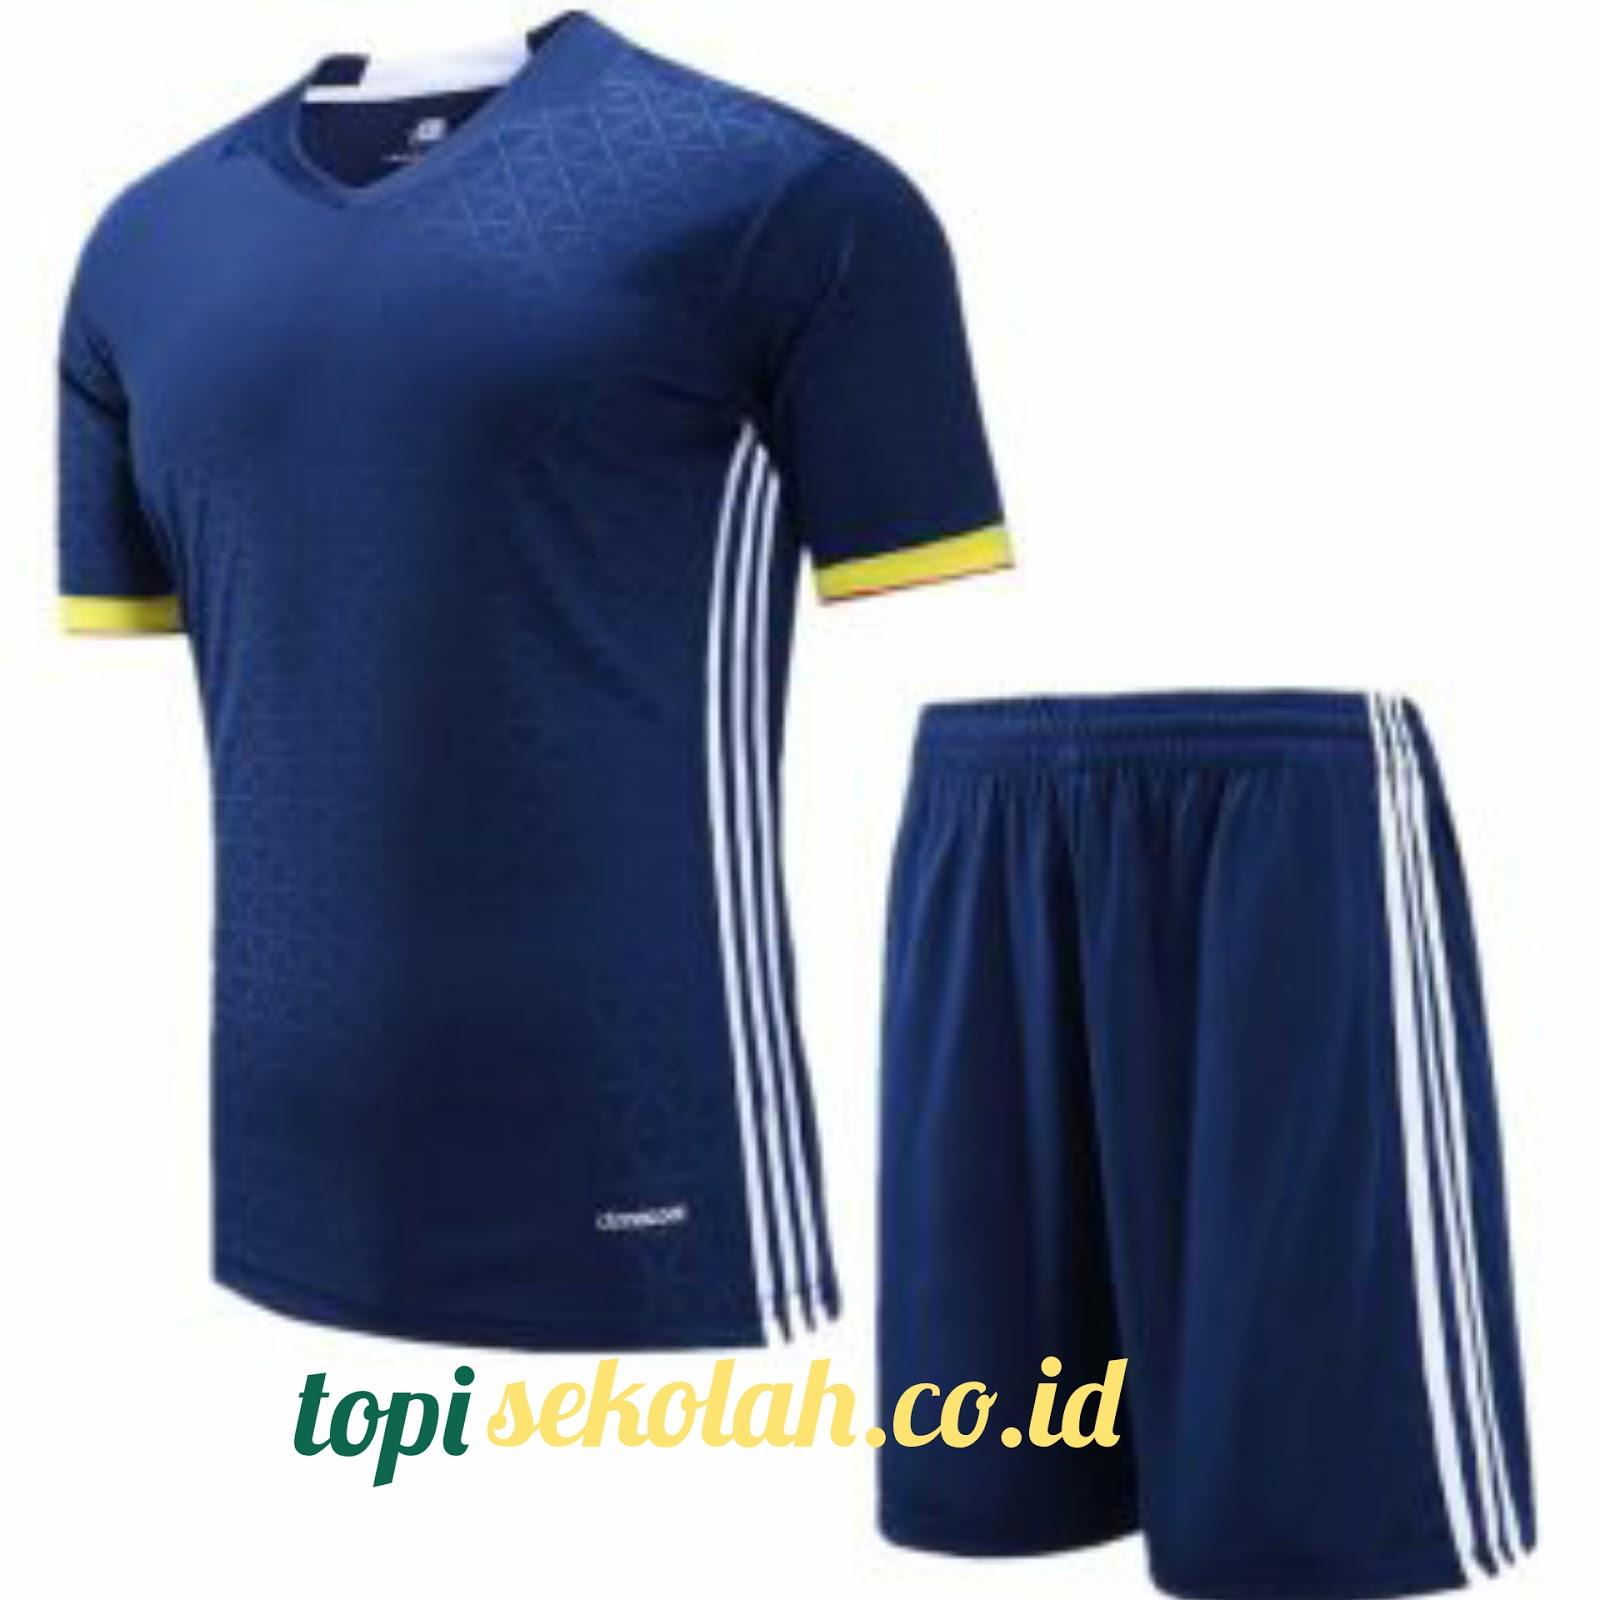 Model Baju Olahraga Sekolah Dasar Nusagates